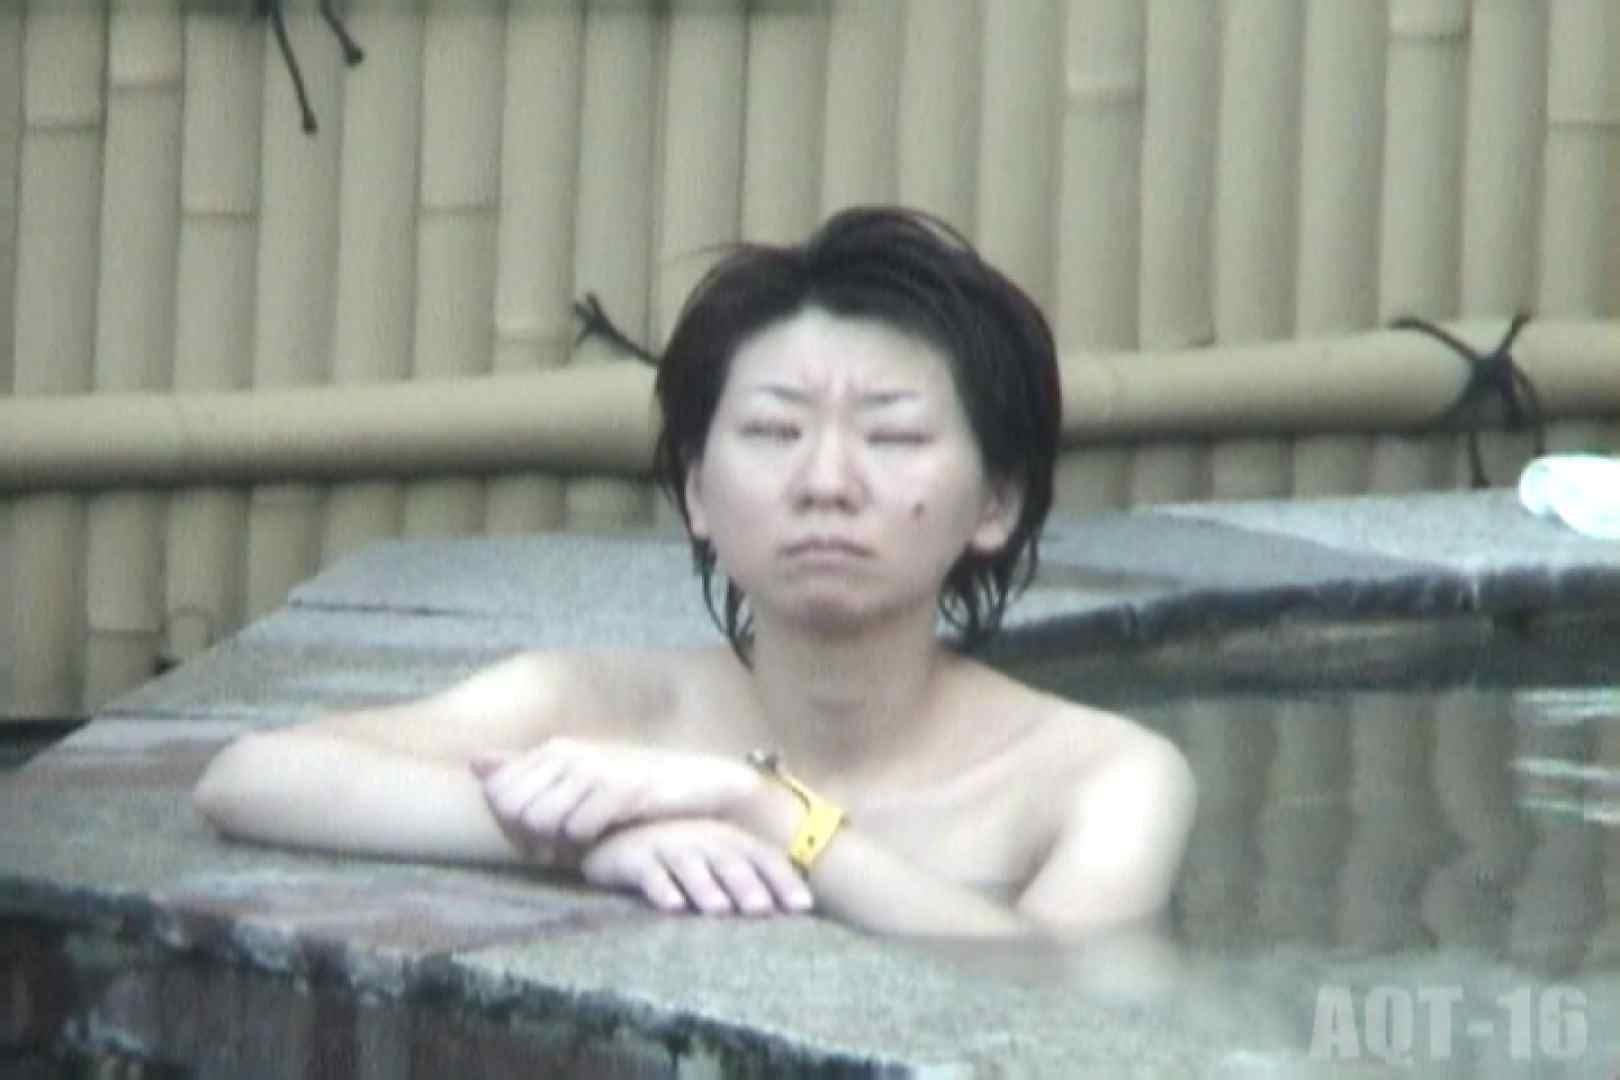 Aquaな露天風呂Vol.842 0  32連発 25